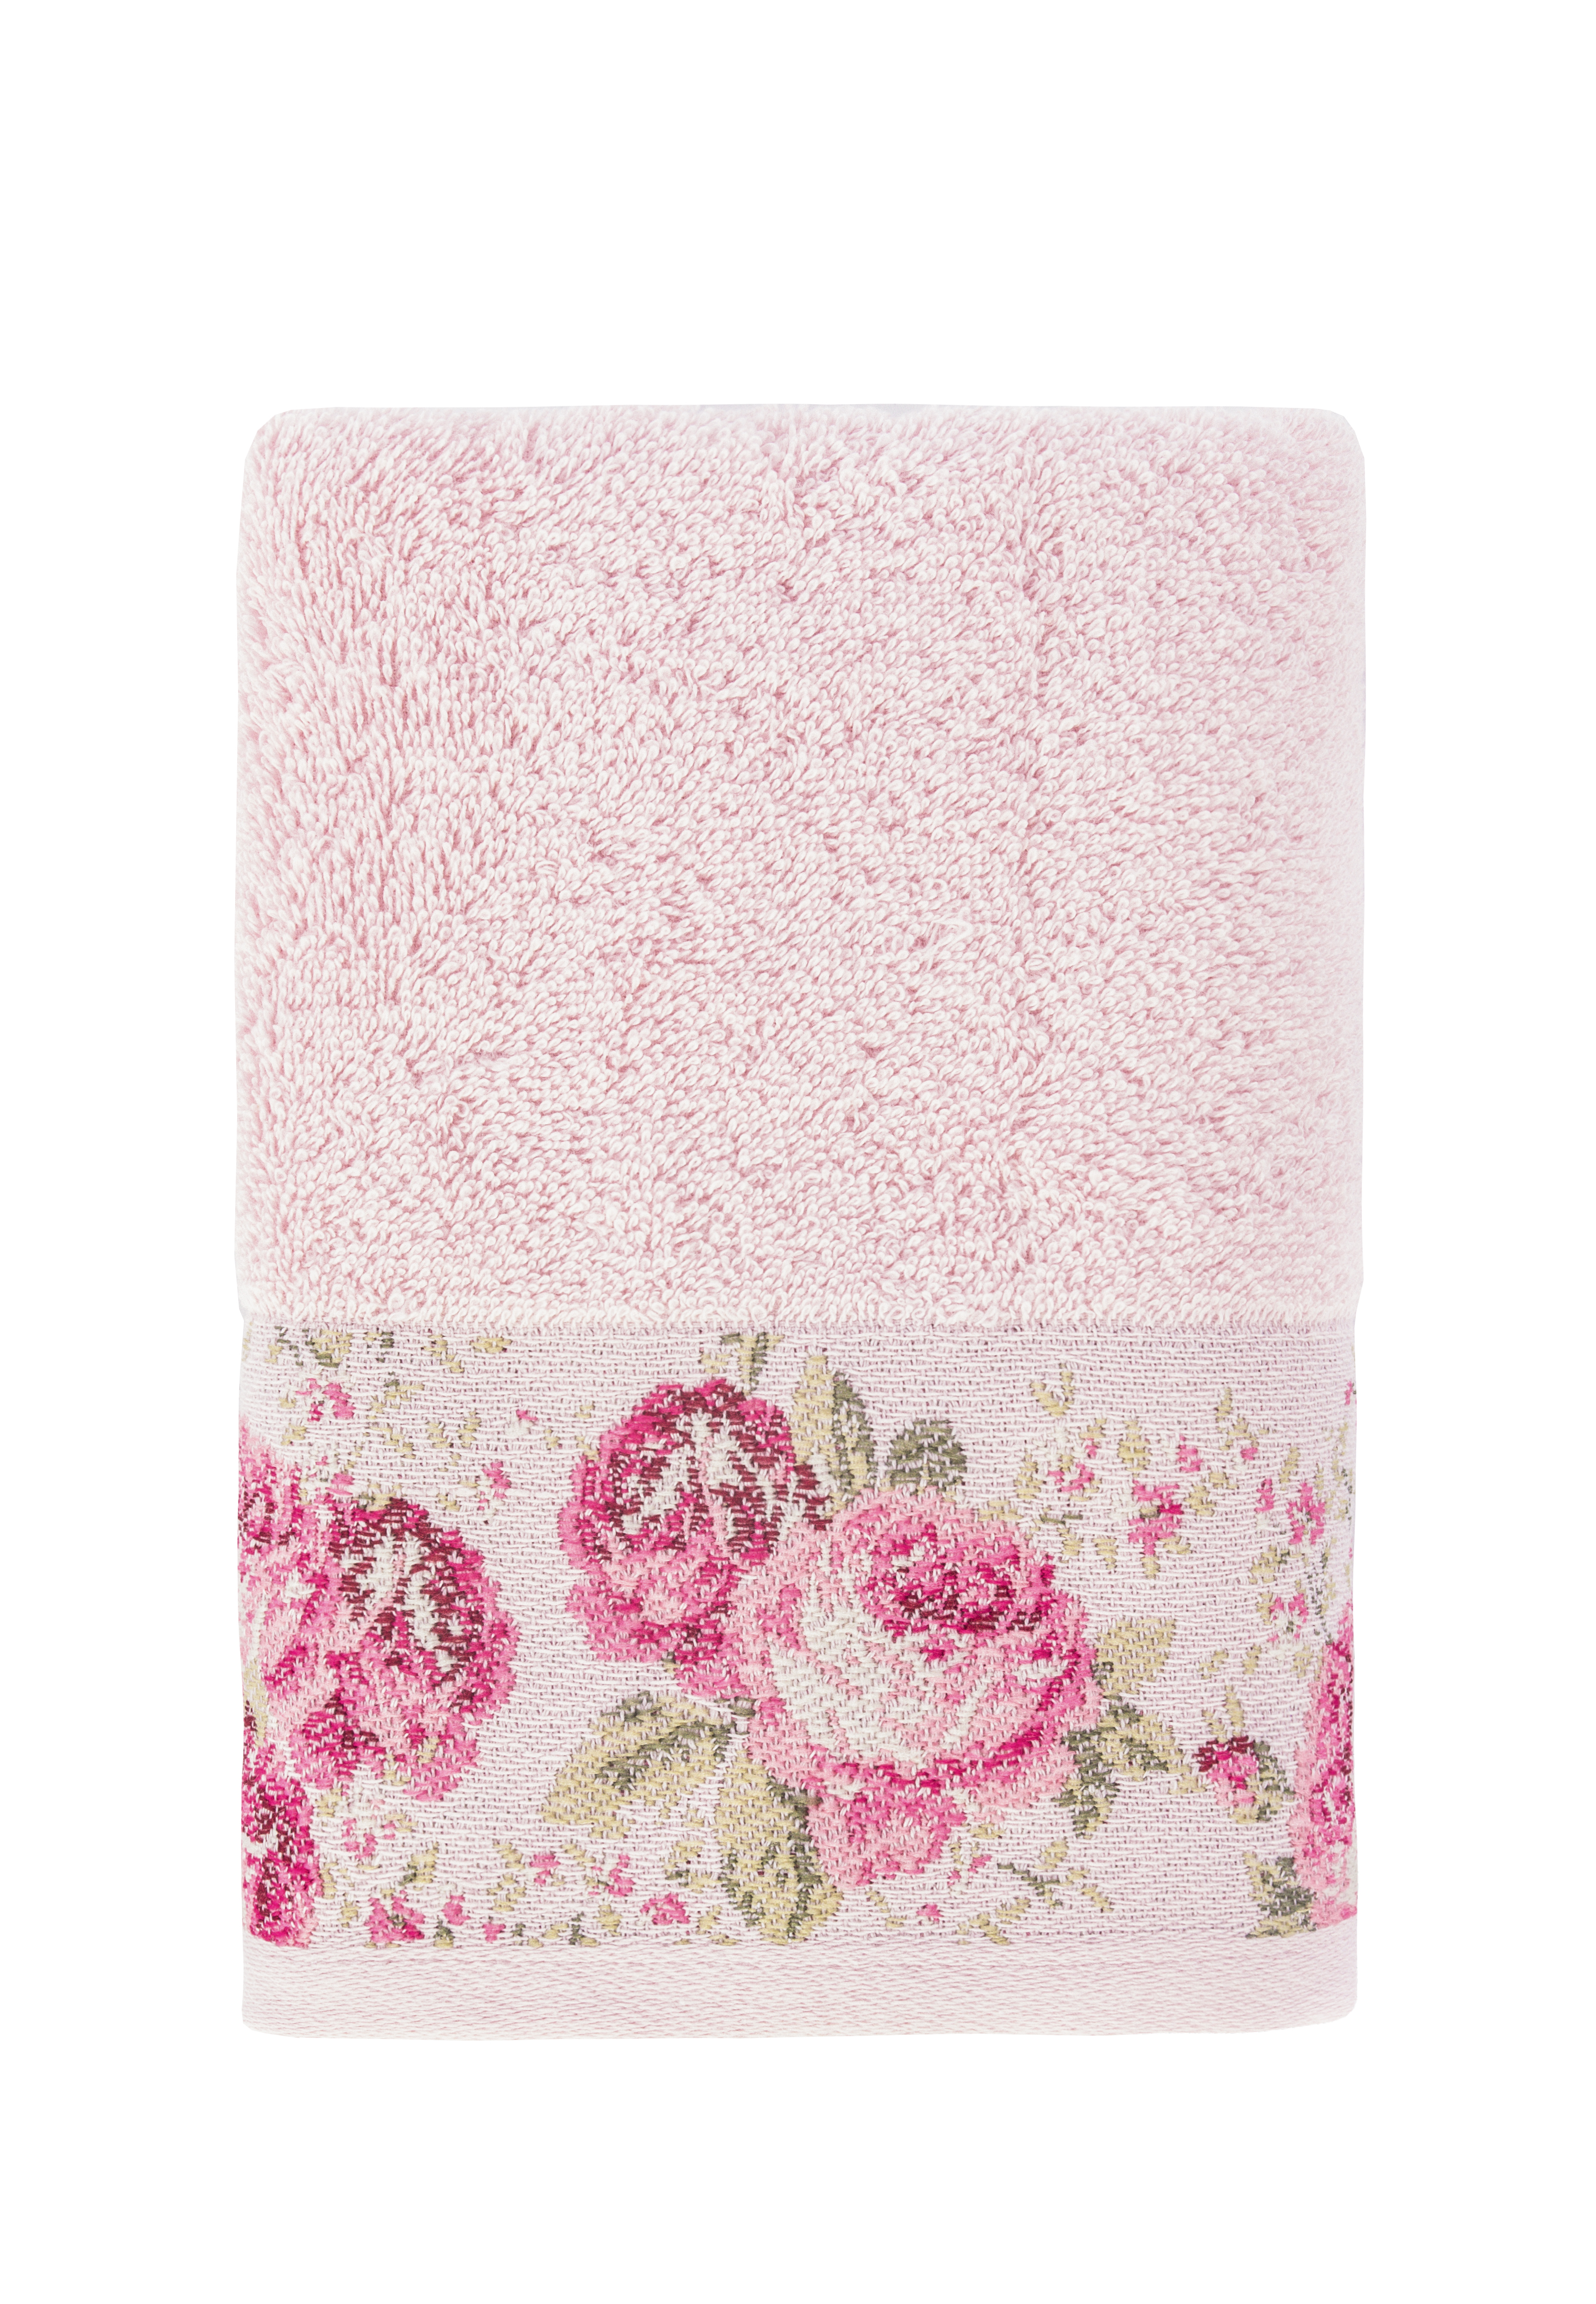 Полотенце банное Arya home collection Desima розовый, розовый полотенца arya полотенце desima цвет пурпурный 70х140 см